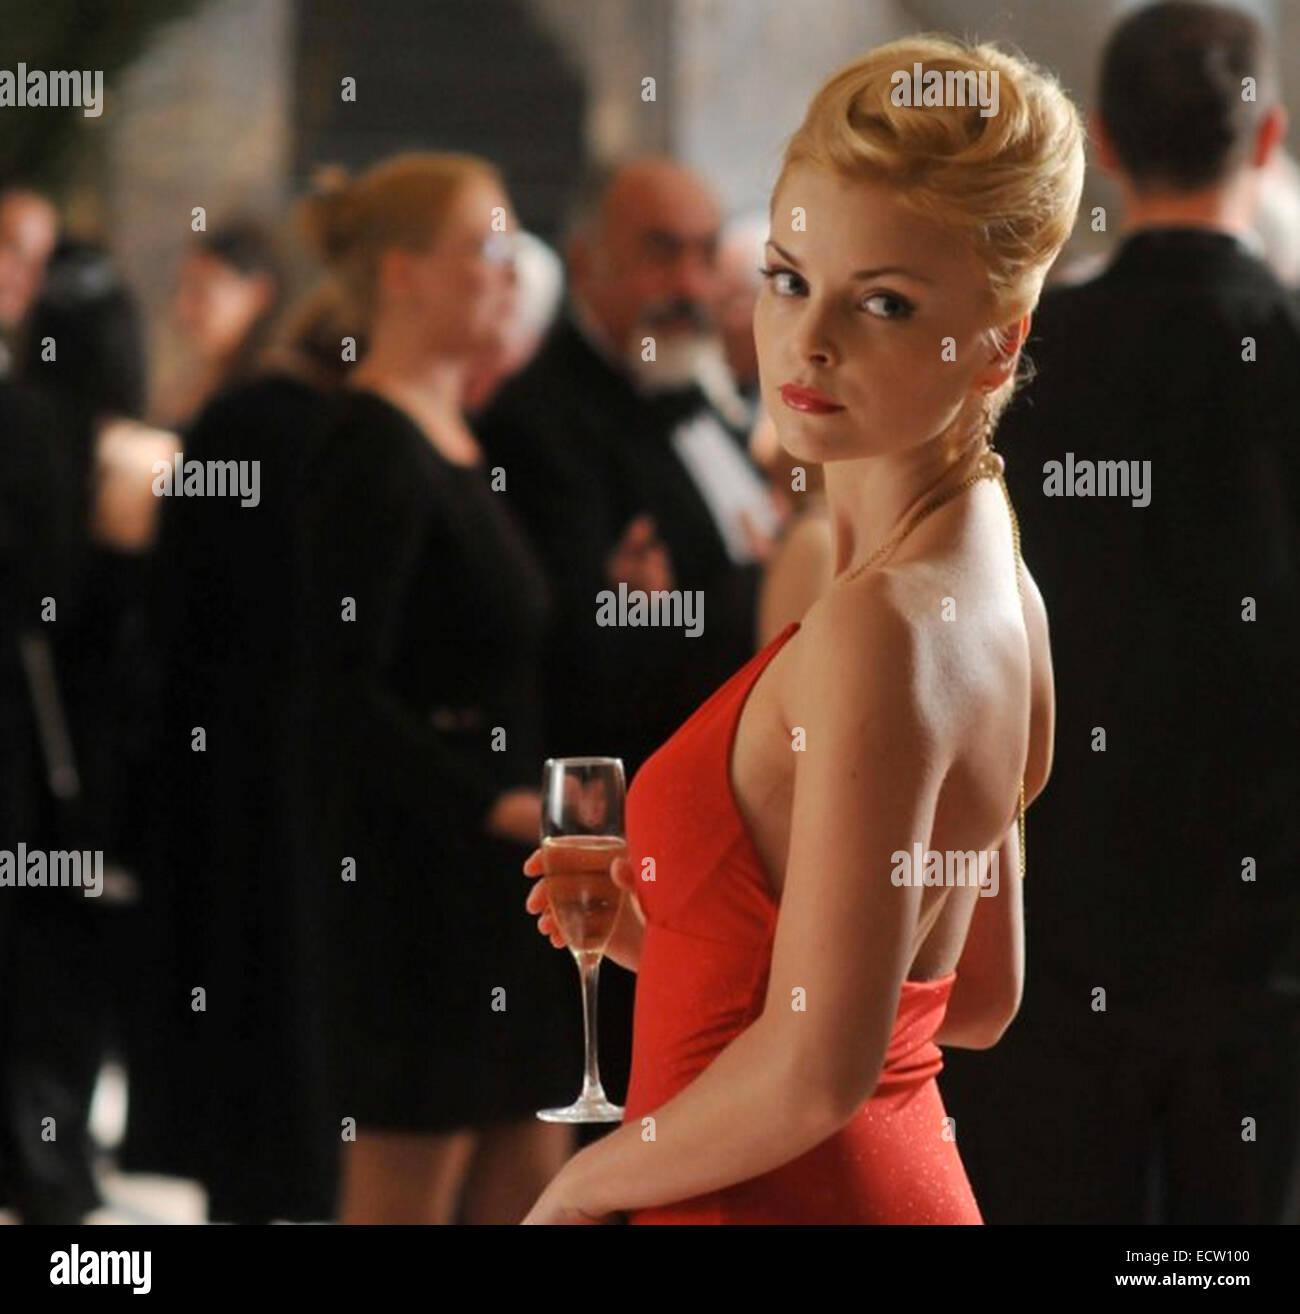 DOUBLE IDENTITY  2009 Millenium Films production with Izabella Miko - Stock Image